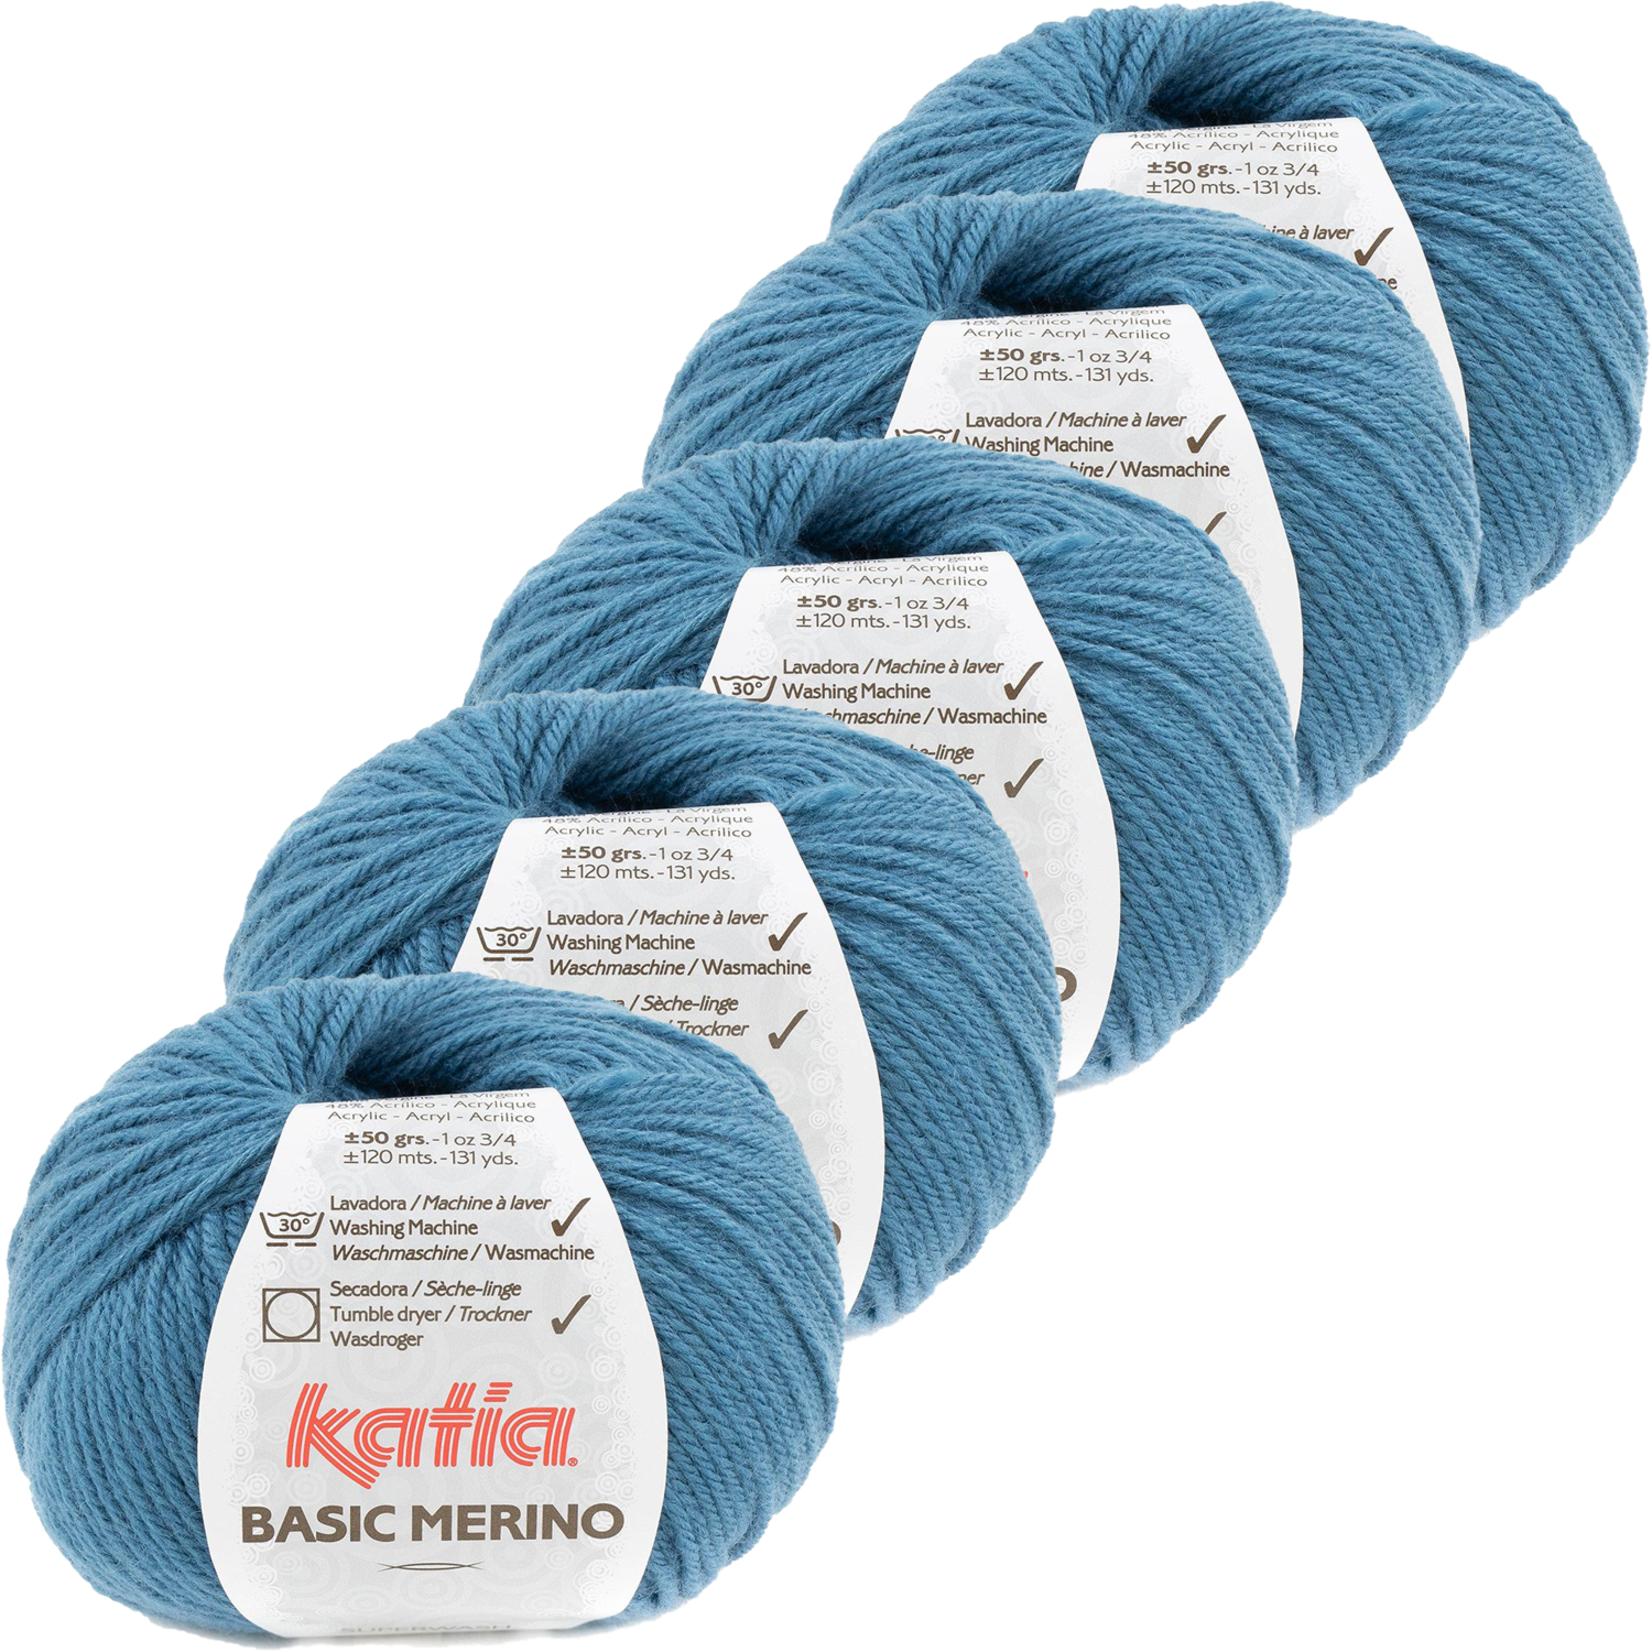 Katia Basic Merino - kleur 81_Licht Groenblauw - bundel 5 bollen 50 gr.  van 120 m.